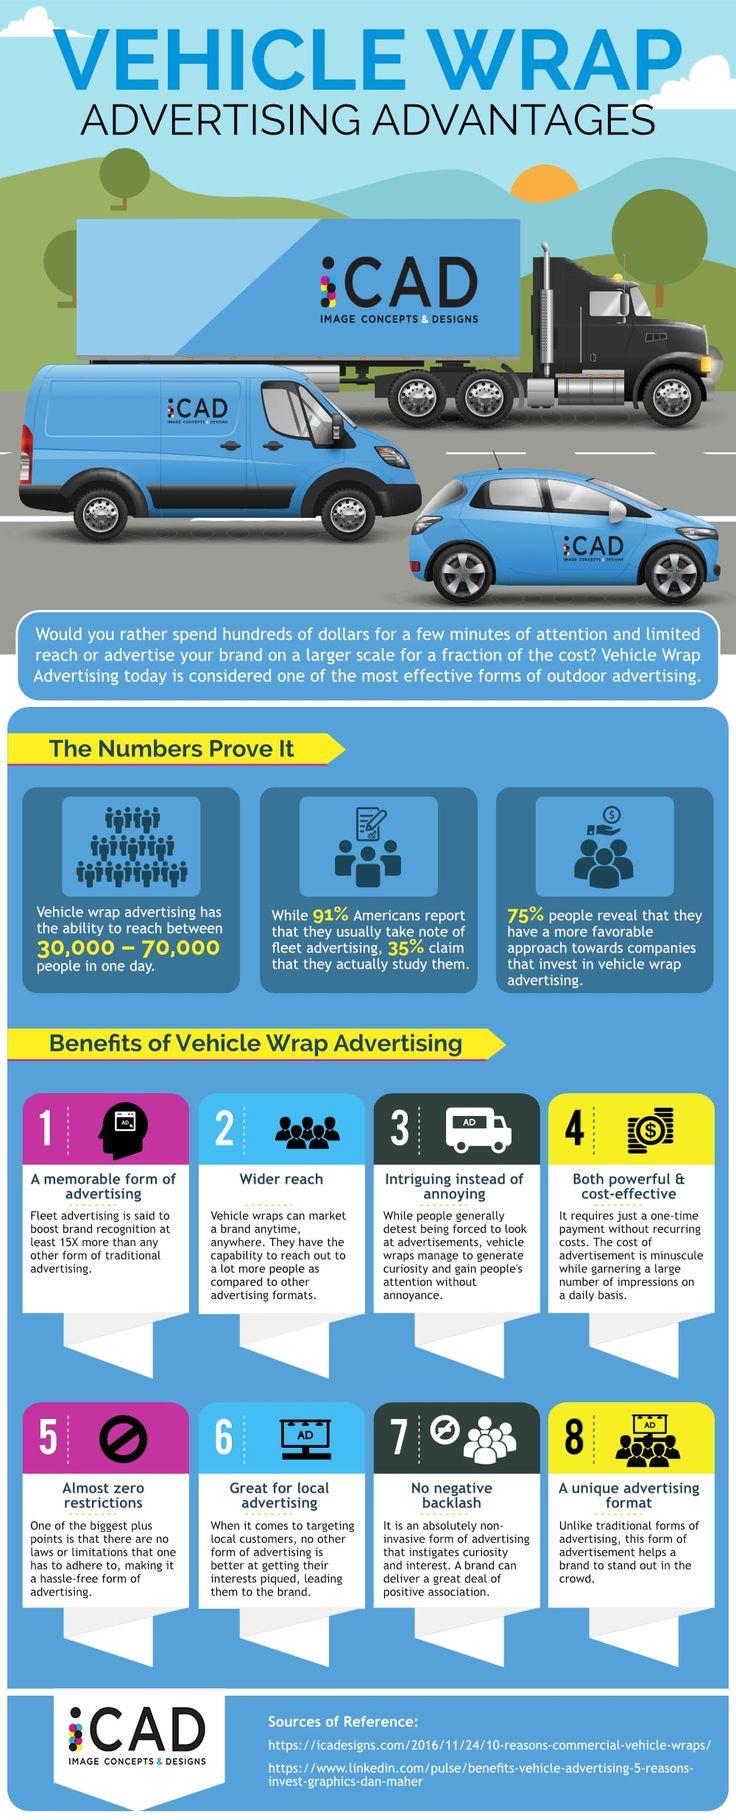 Vehicle Wrap Advertising Advantages